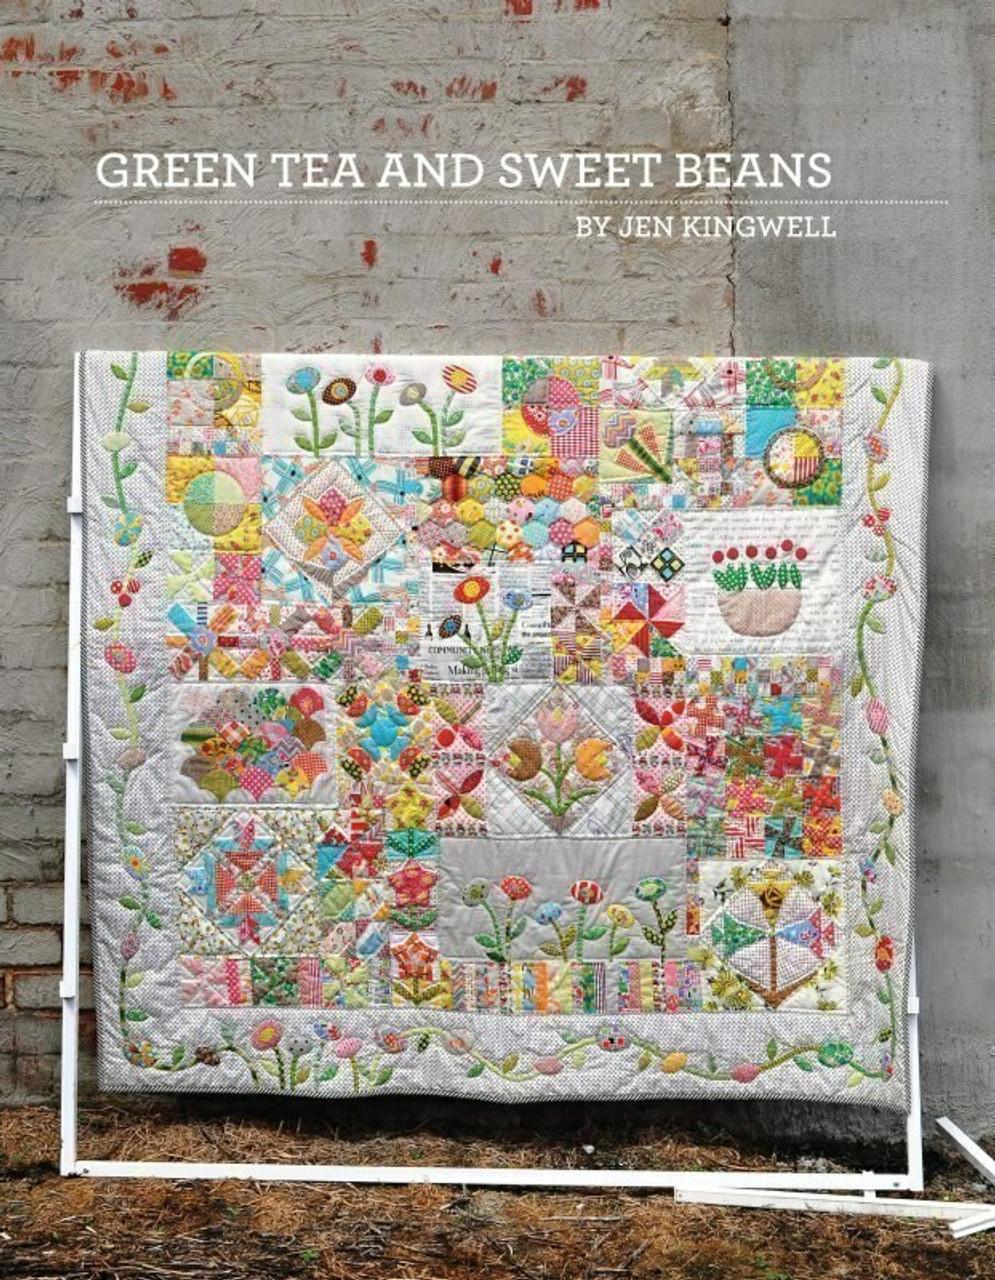 Jen Kingwell : Green Tea and Sweet Beans